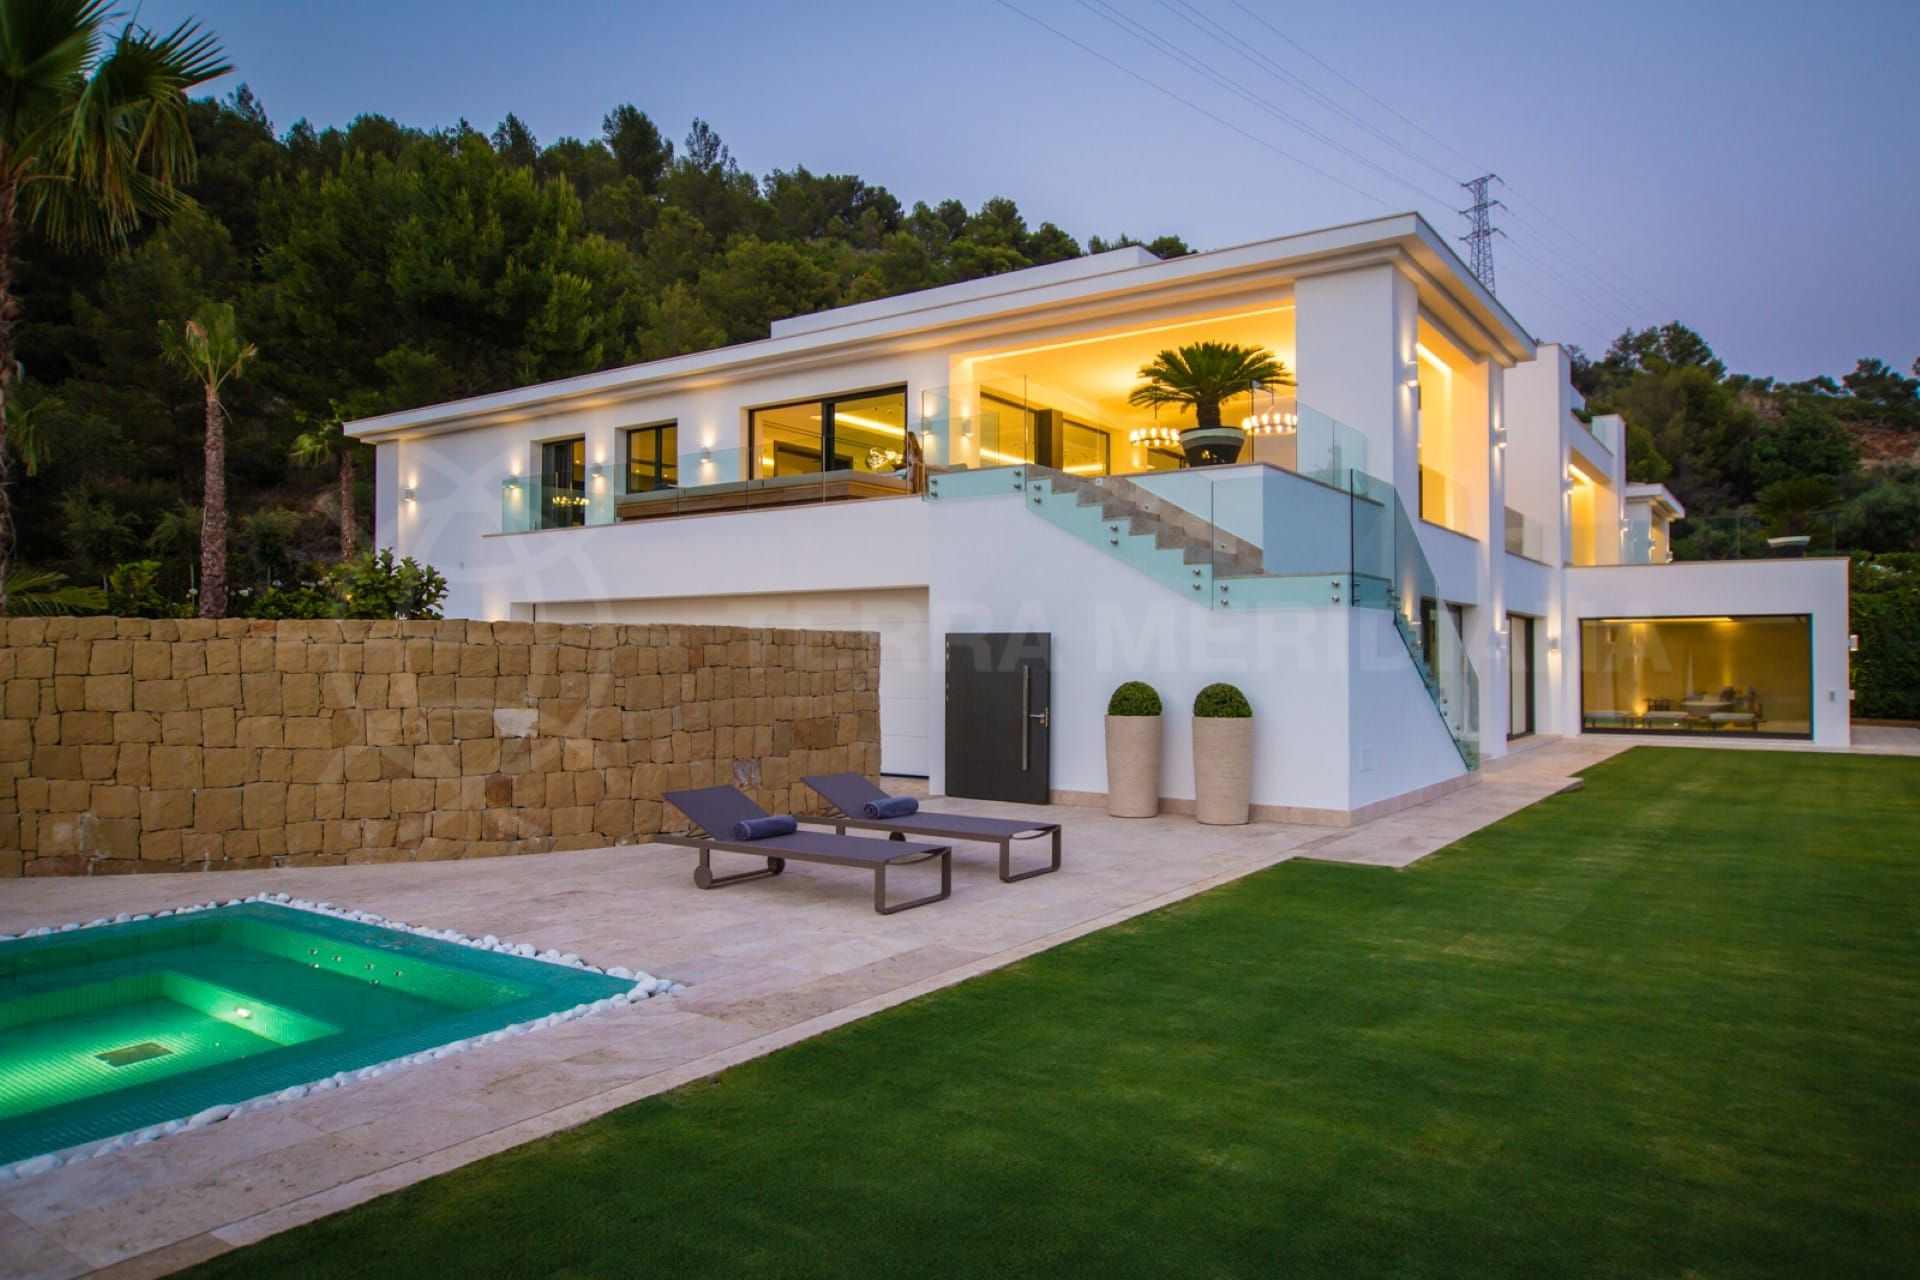 Rental checklist for tenants in Spain